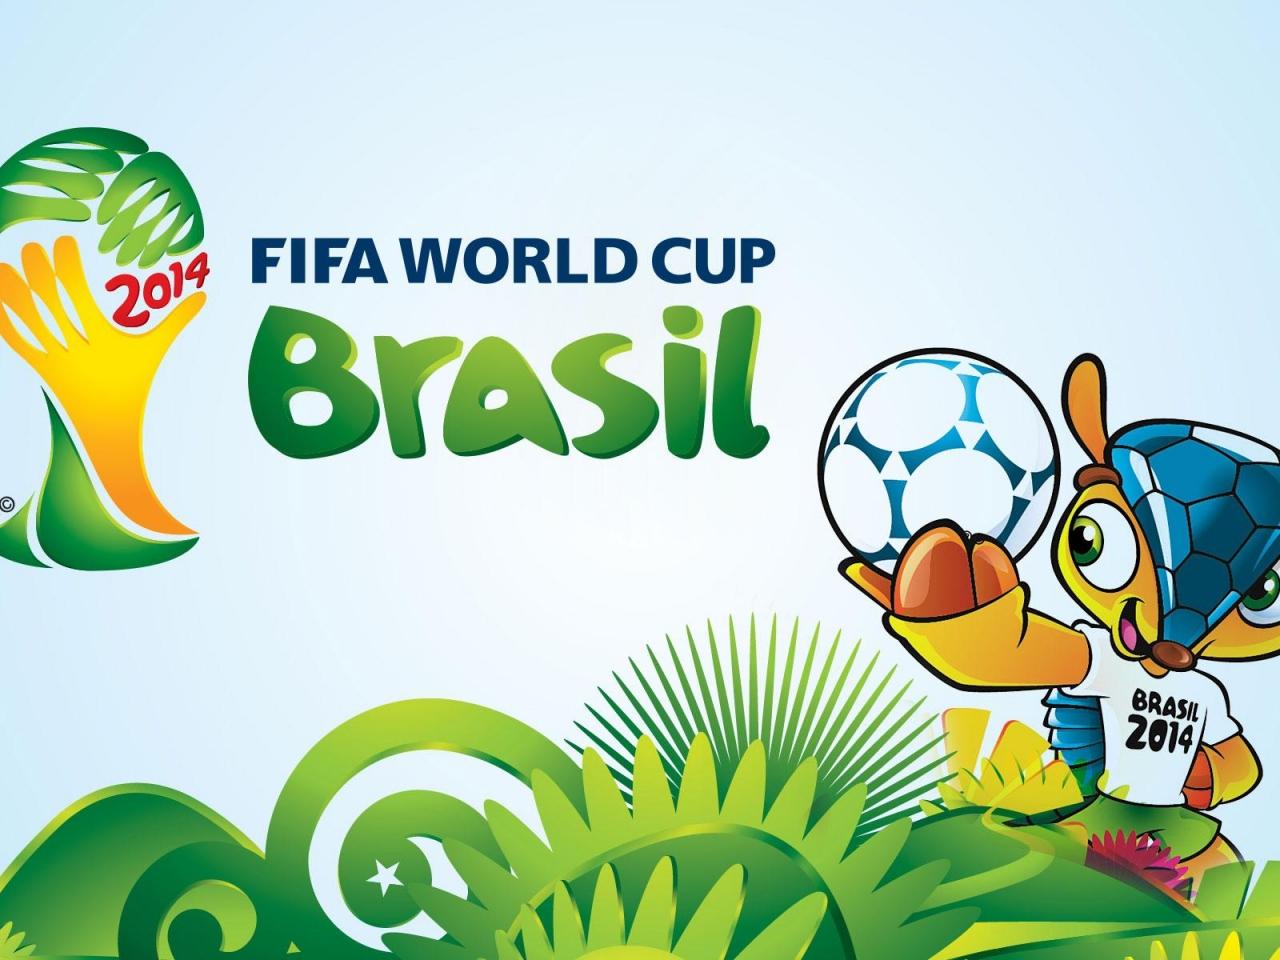 Brasil 2014 mascota - 1280x960